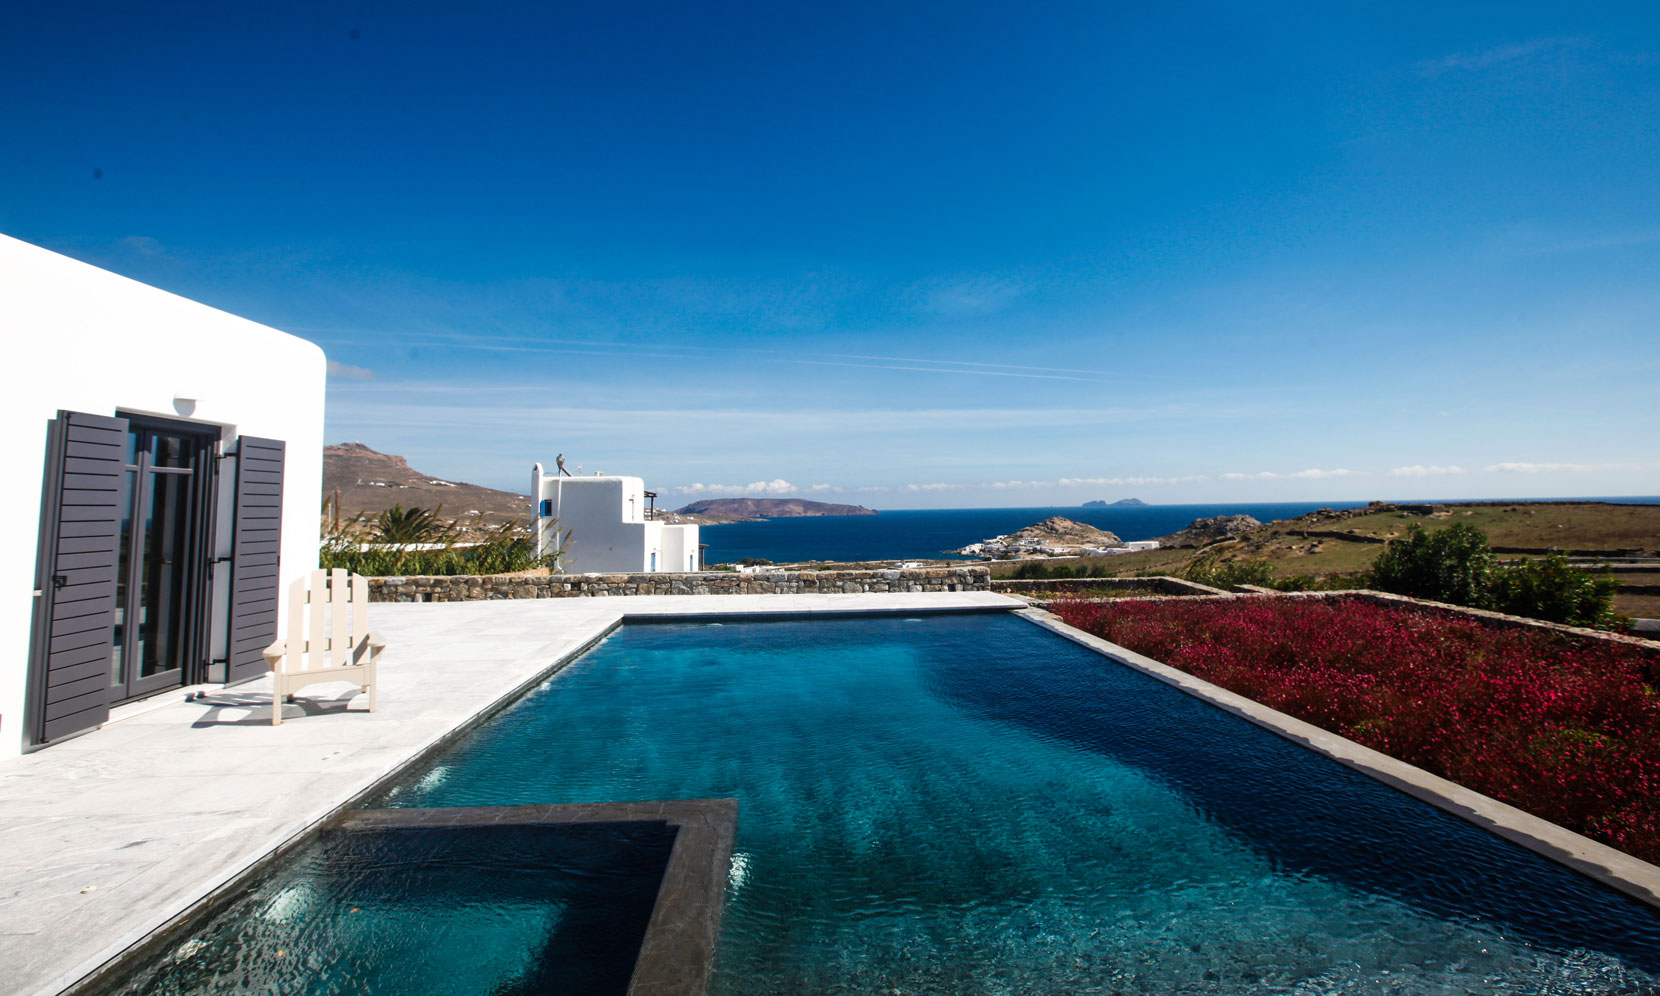 Mykonos Villa Melpo jumbotron image